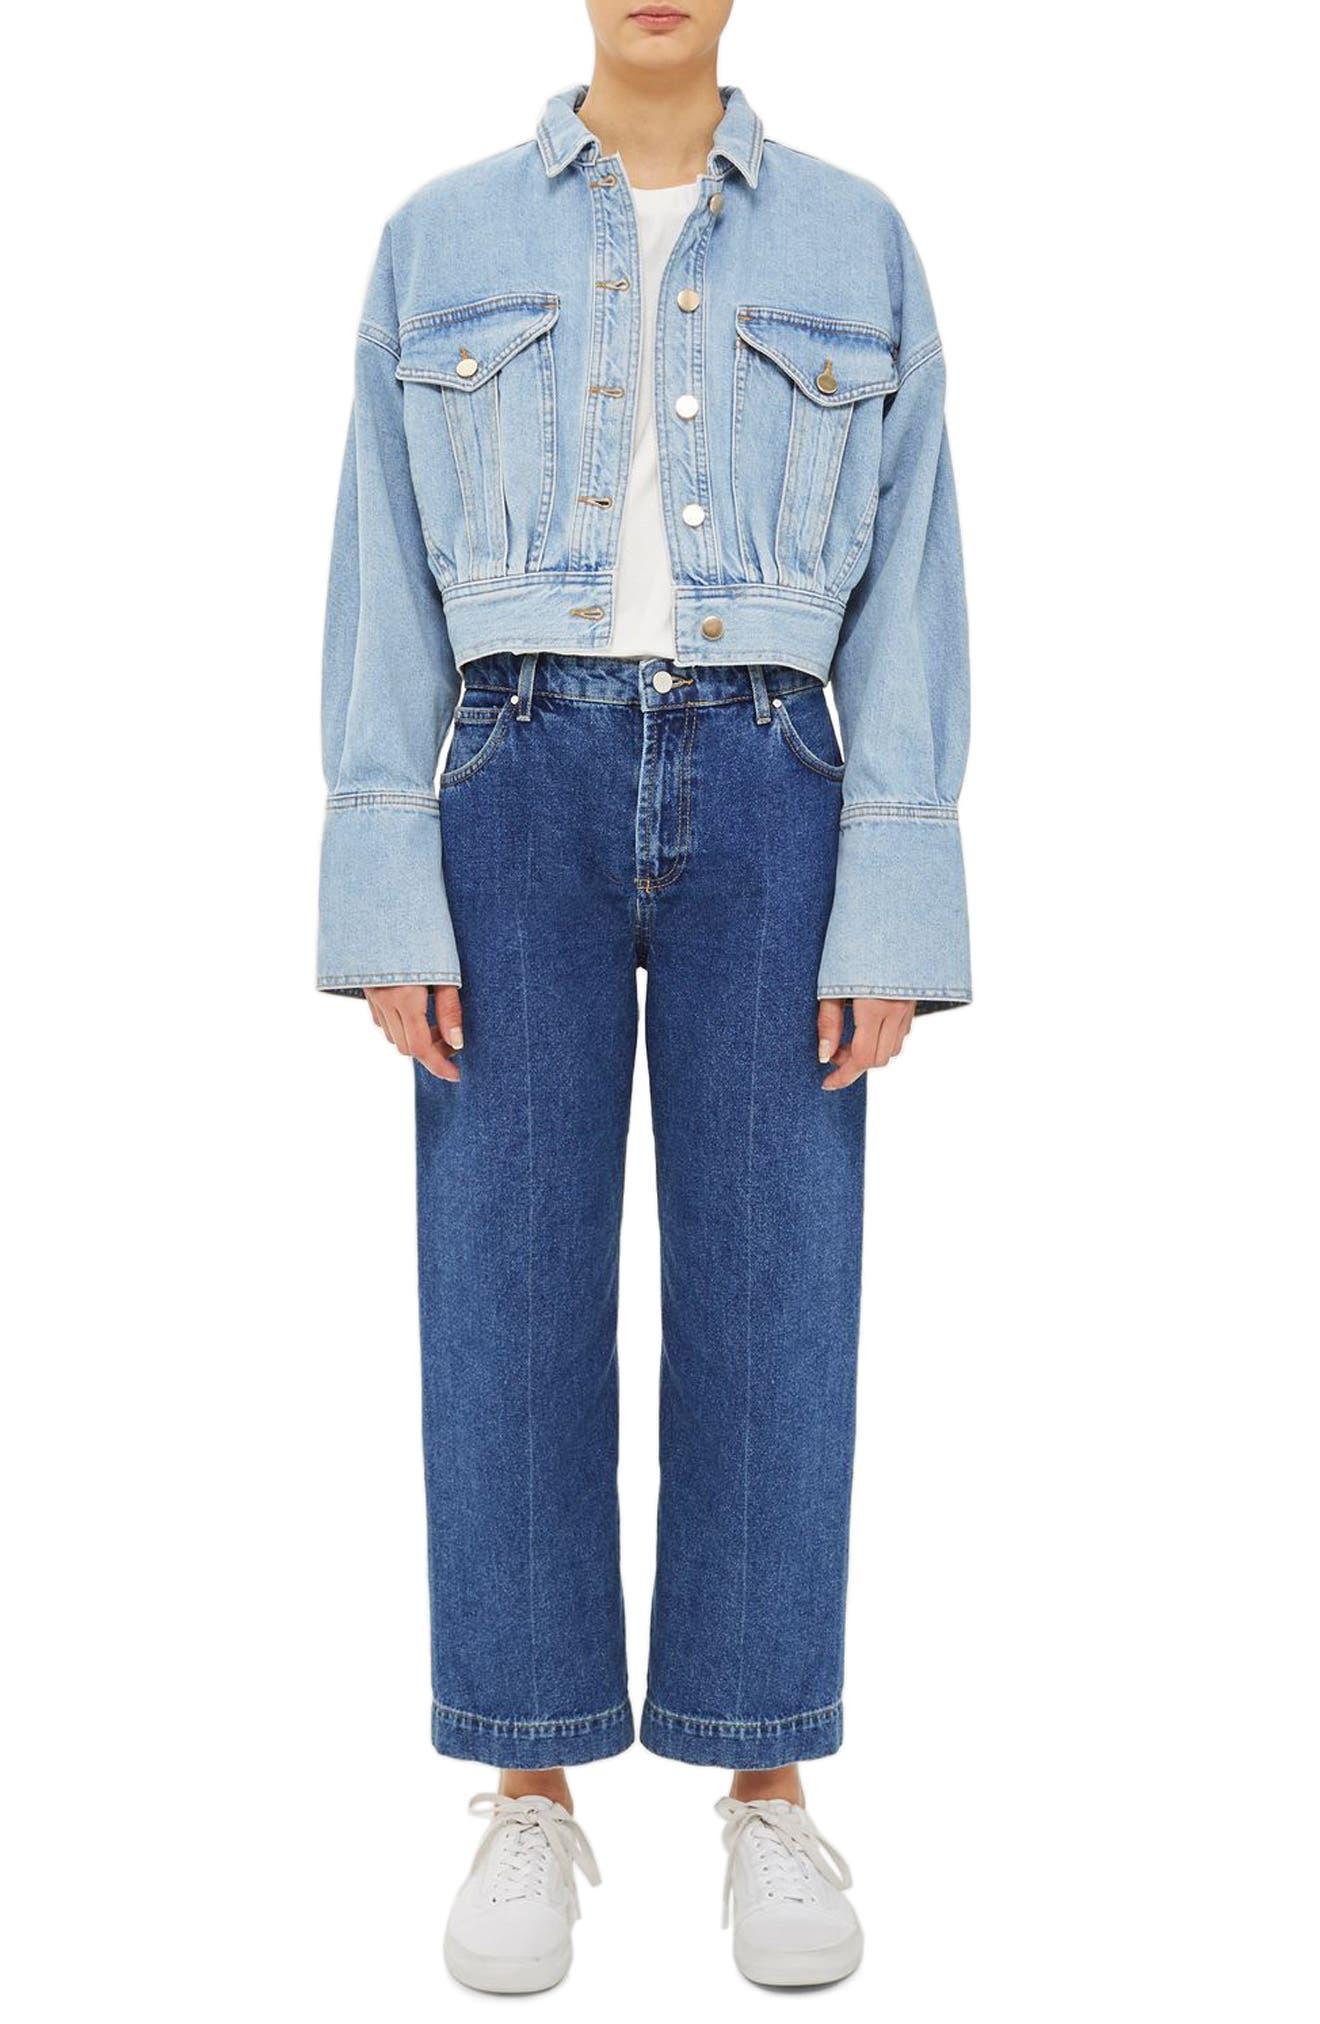 Topshop Boutique Crop Denim Jacket